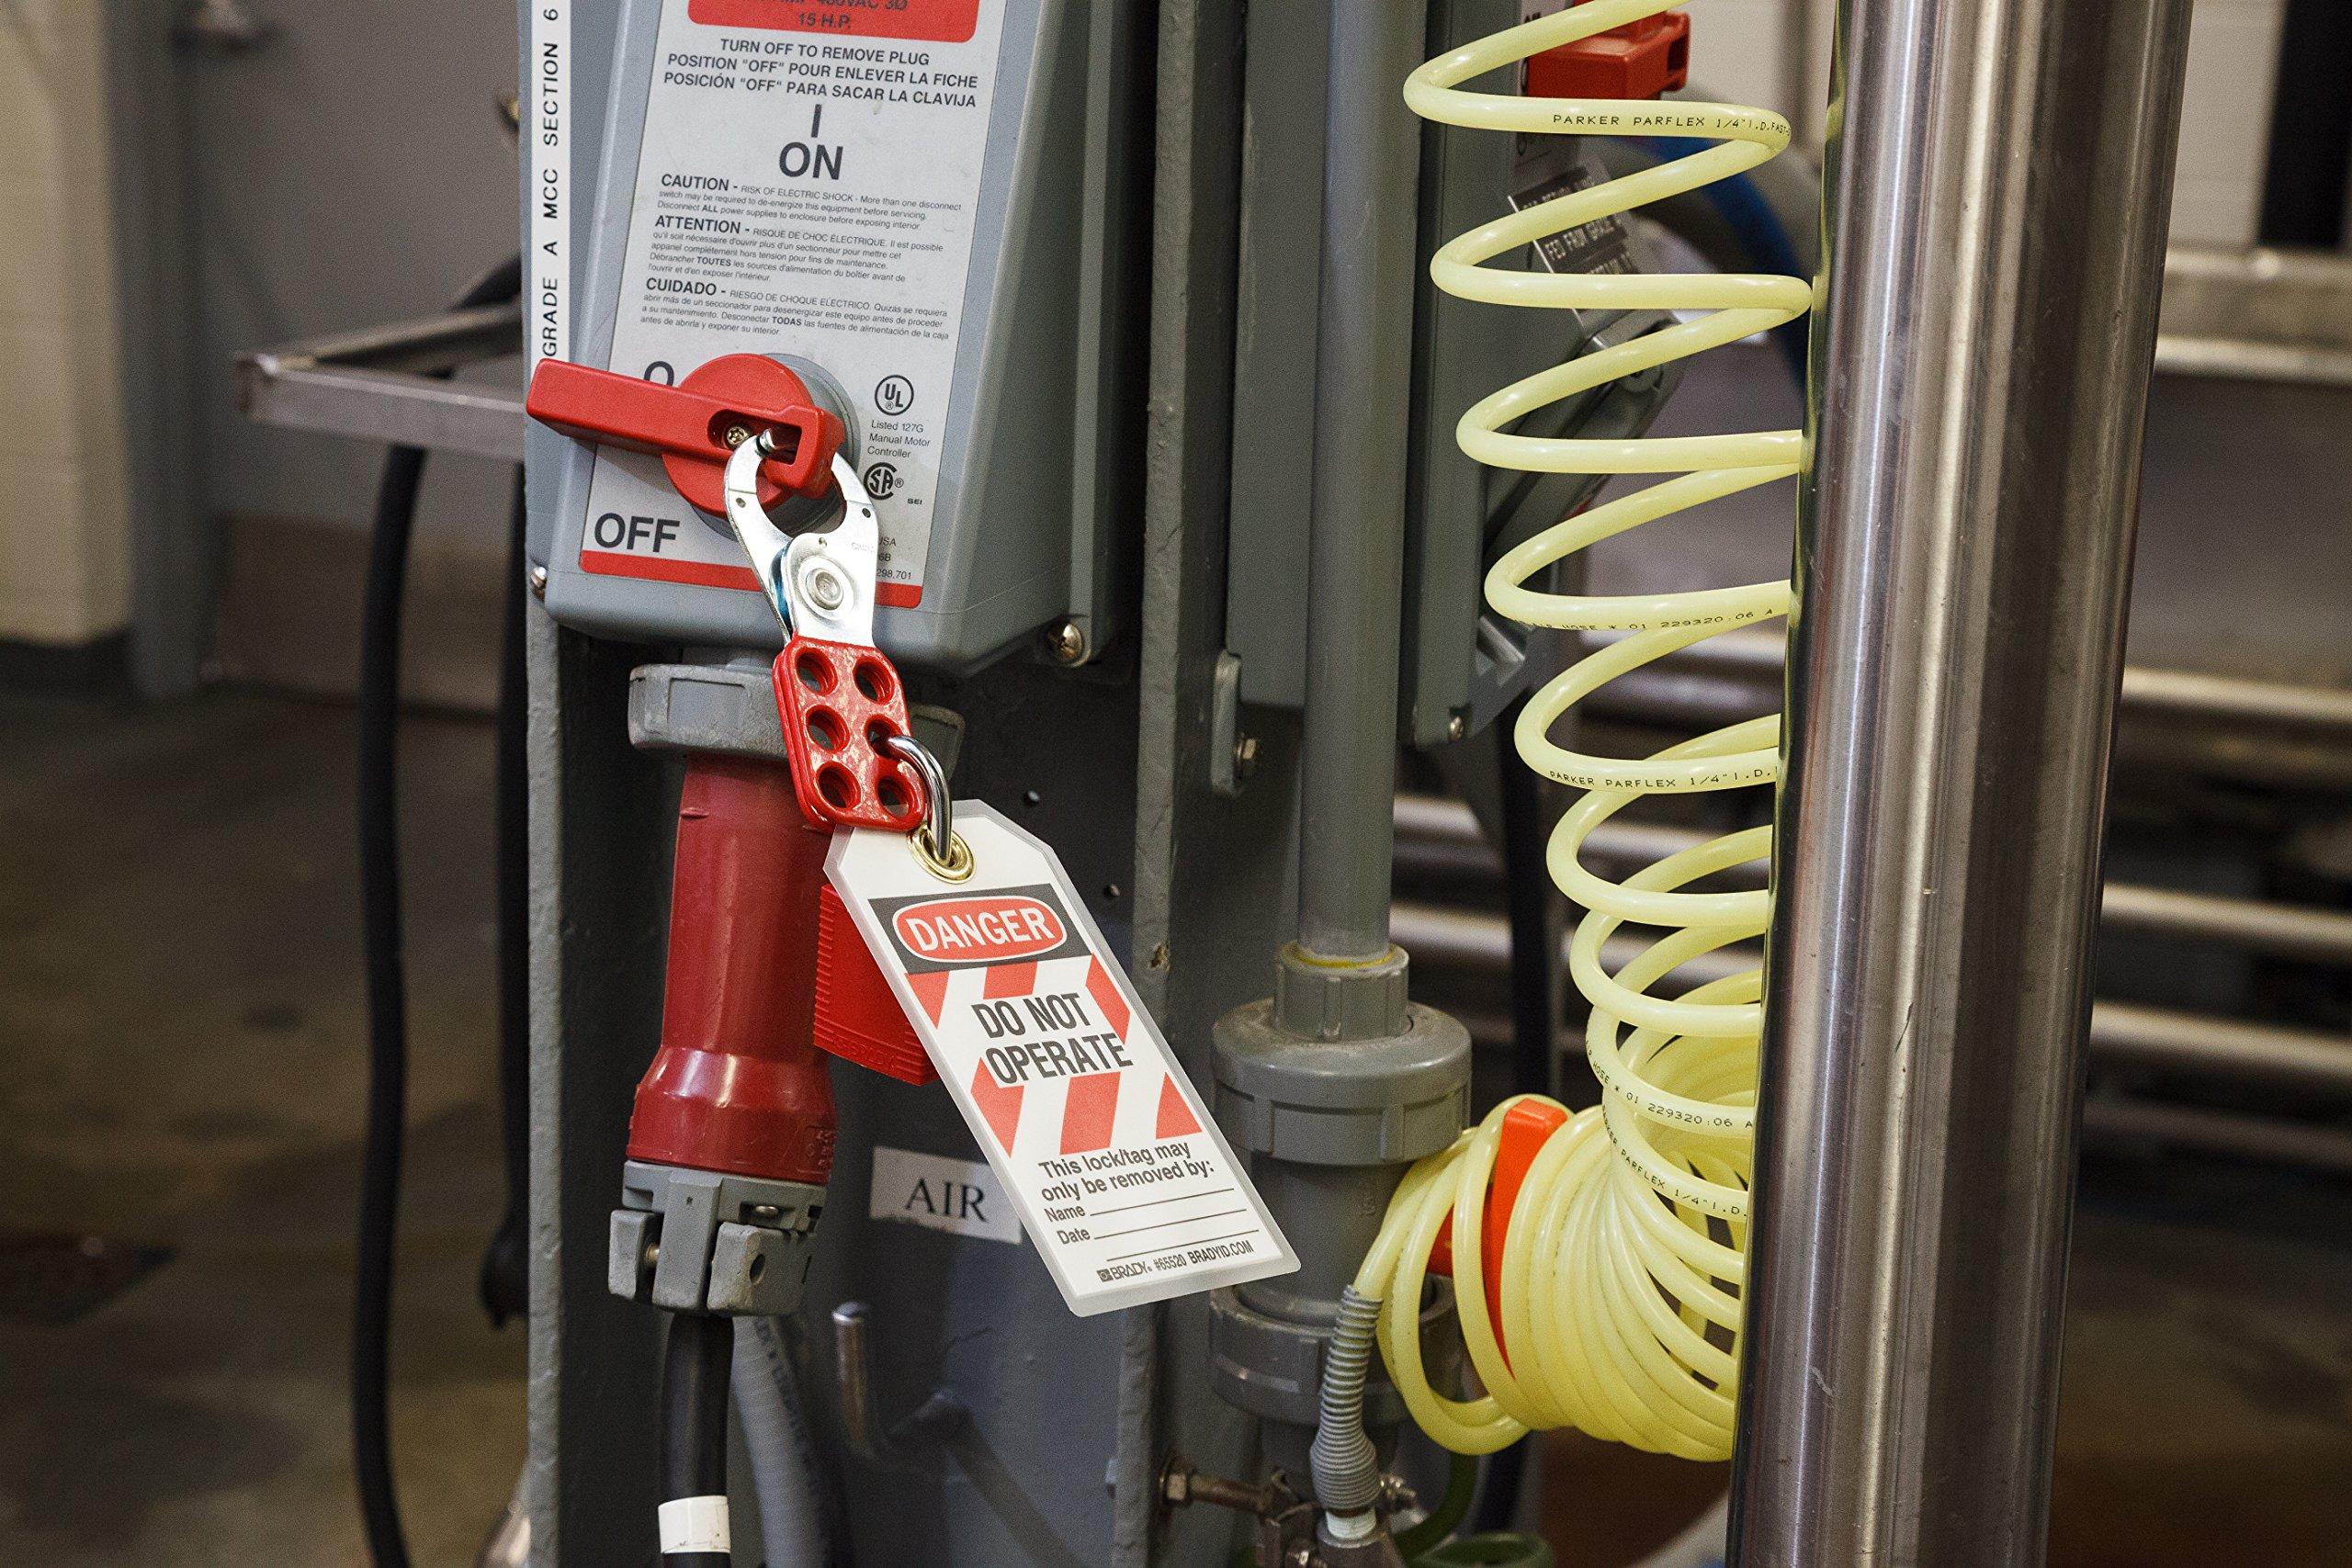 Brady 95548 Portable Lockout Kit, Fill, Electrical, Pouch by Brady (Image #6)